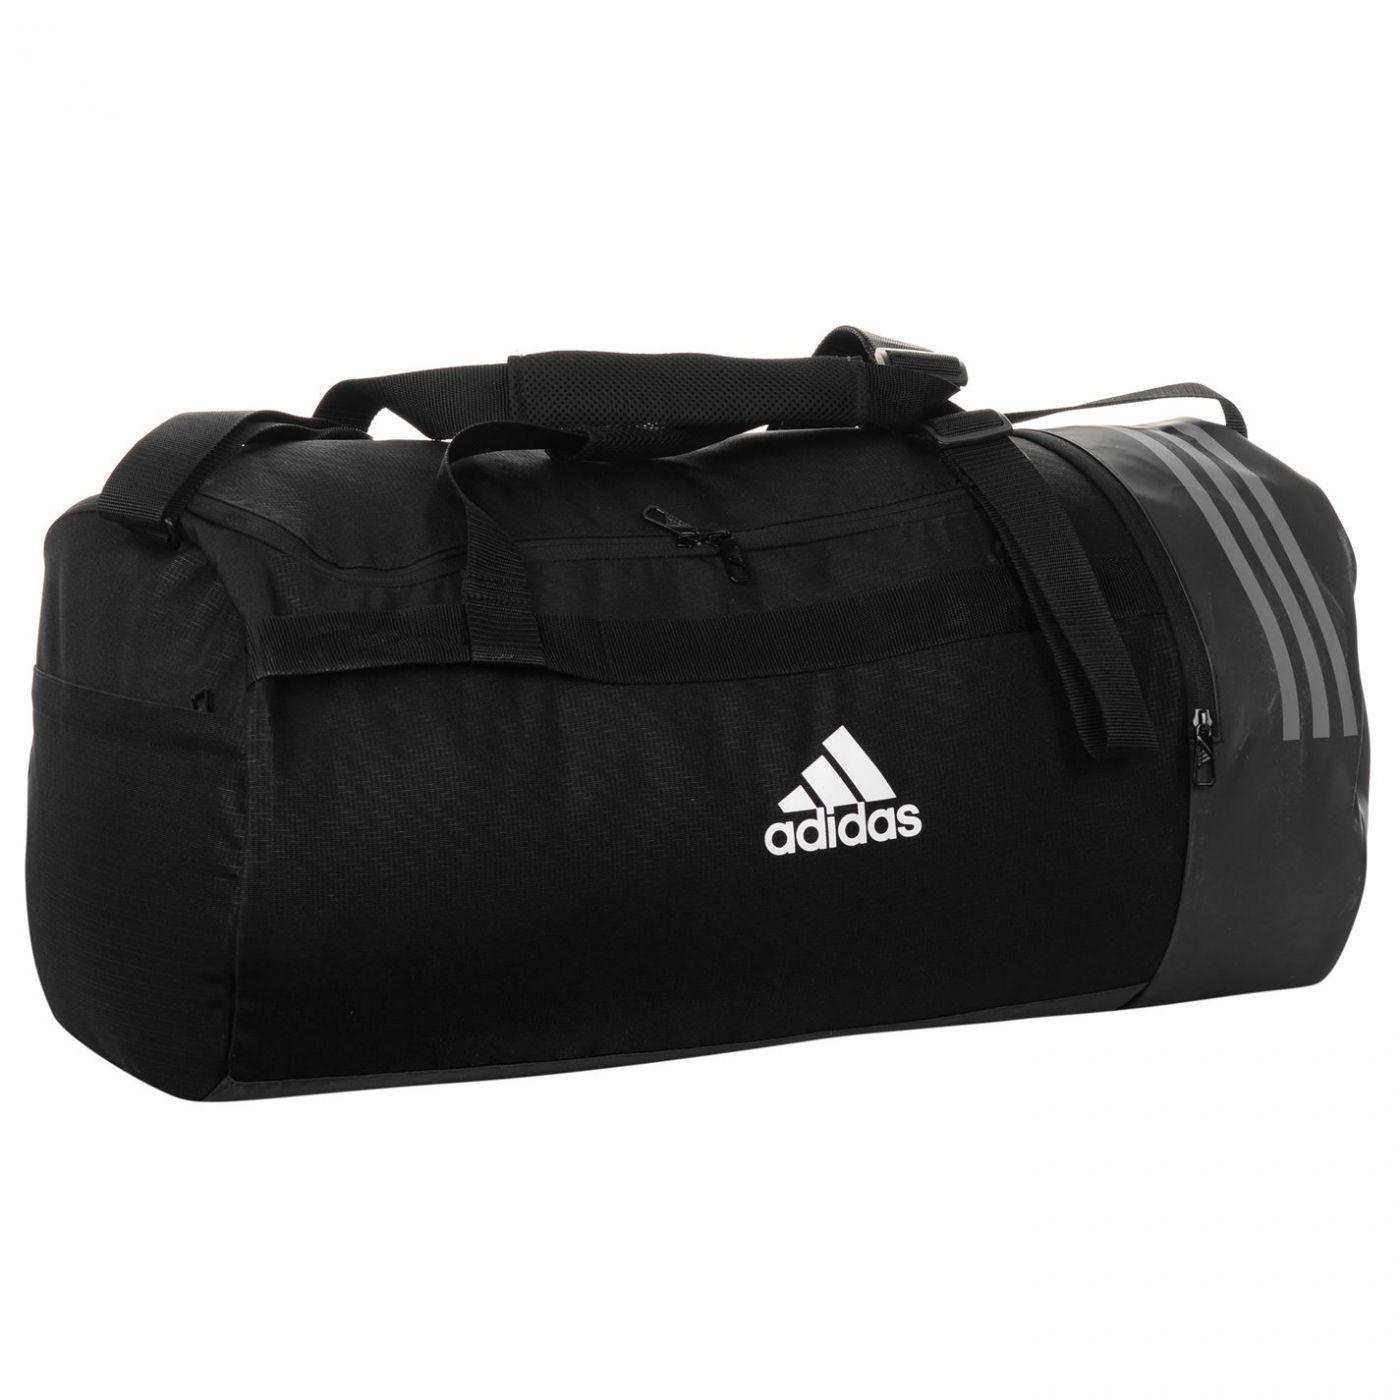 0992359140c28 Adidas Convertible 3 Stripe Duffel Bag - FACTCOOL